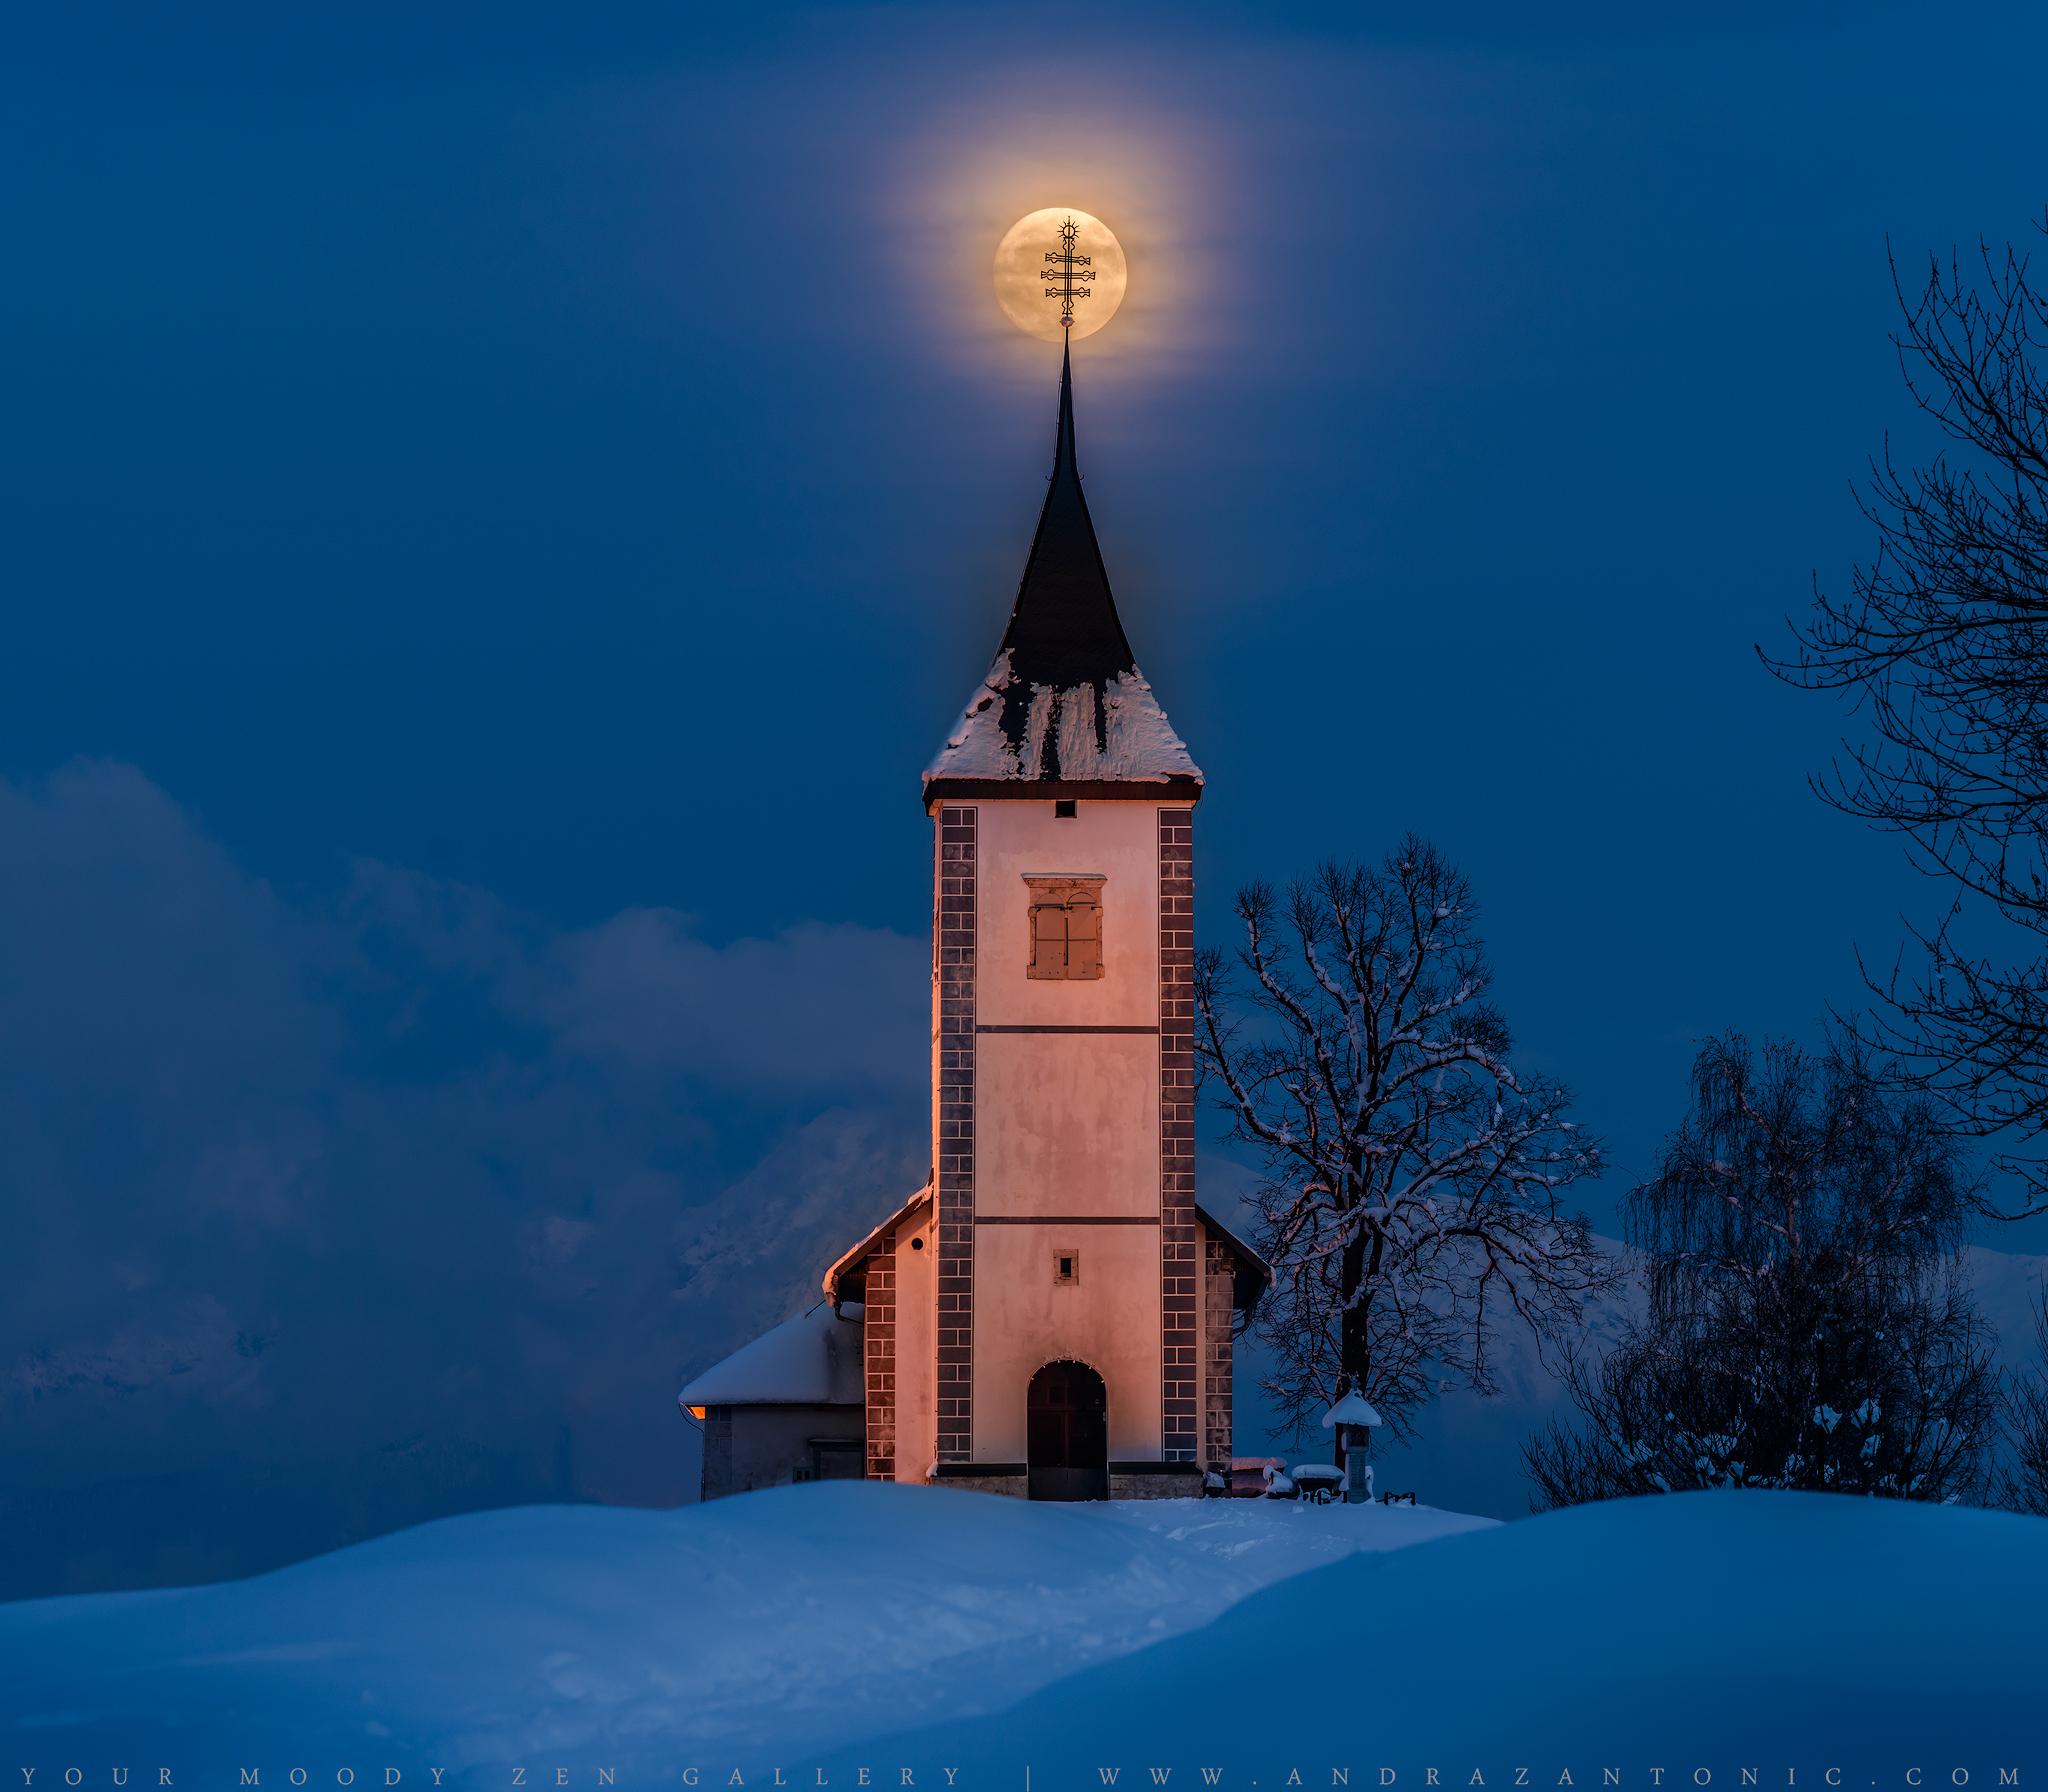 Moonrise over Jamnik